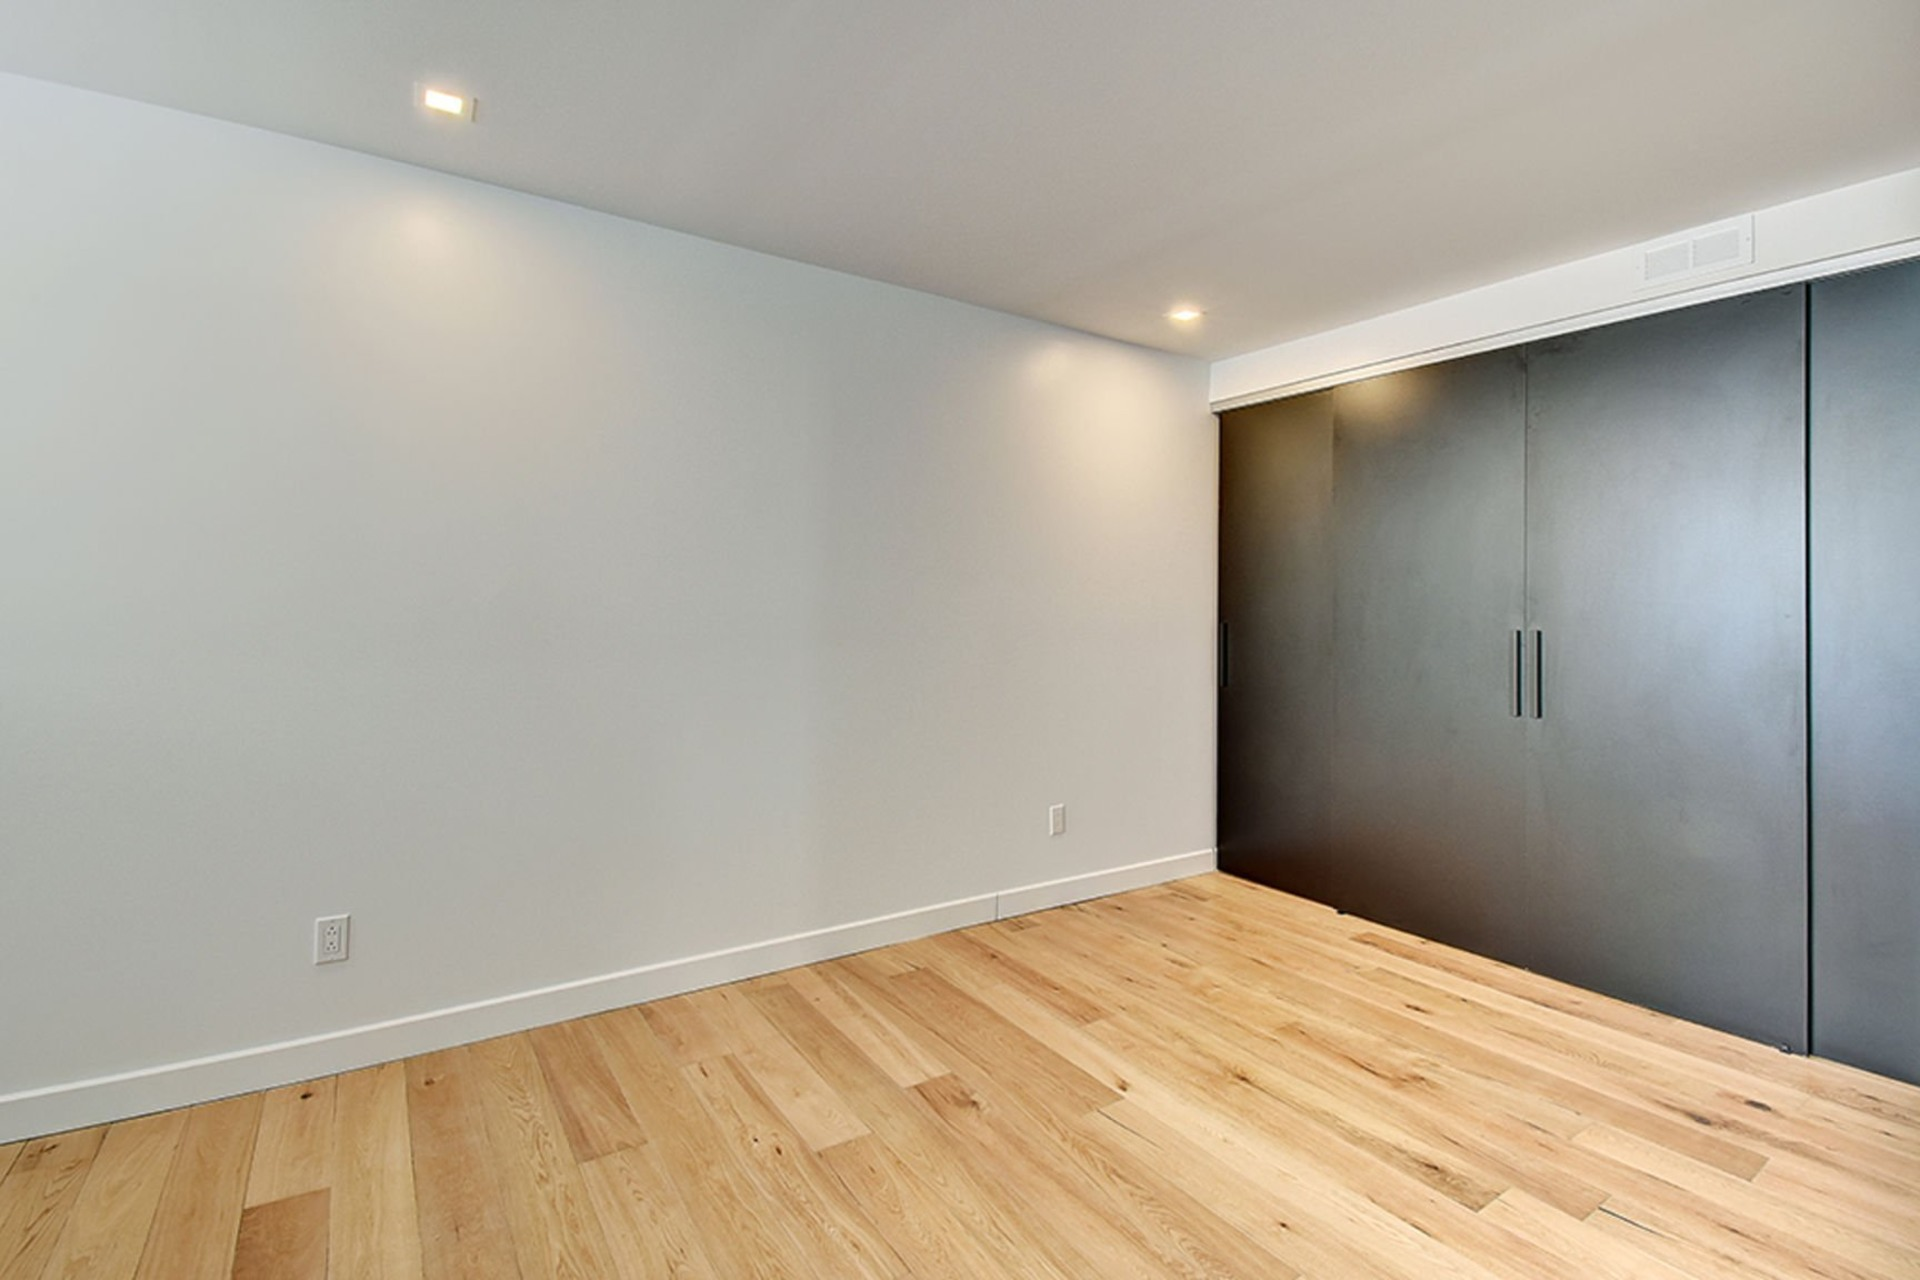 image 14 - Apartment For sale Le Vieux-Longueuil Longueuil  - 9 rooms